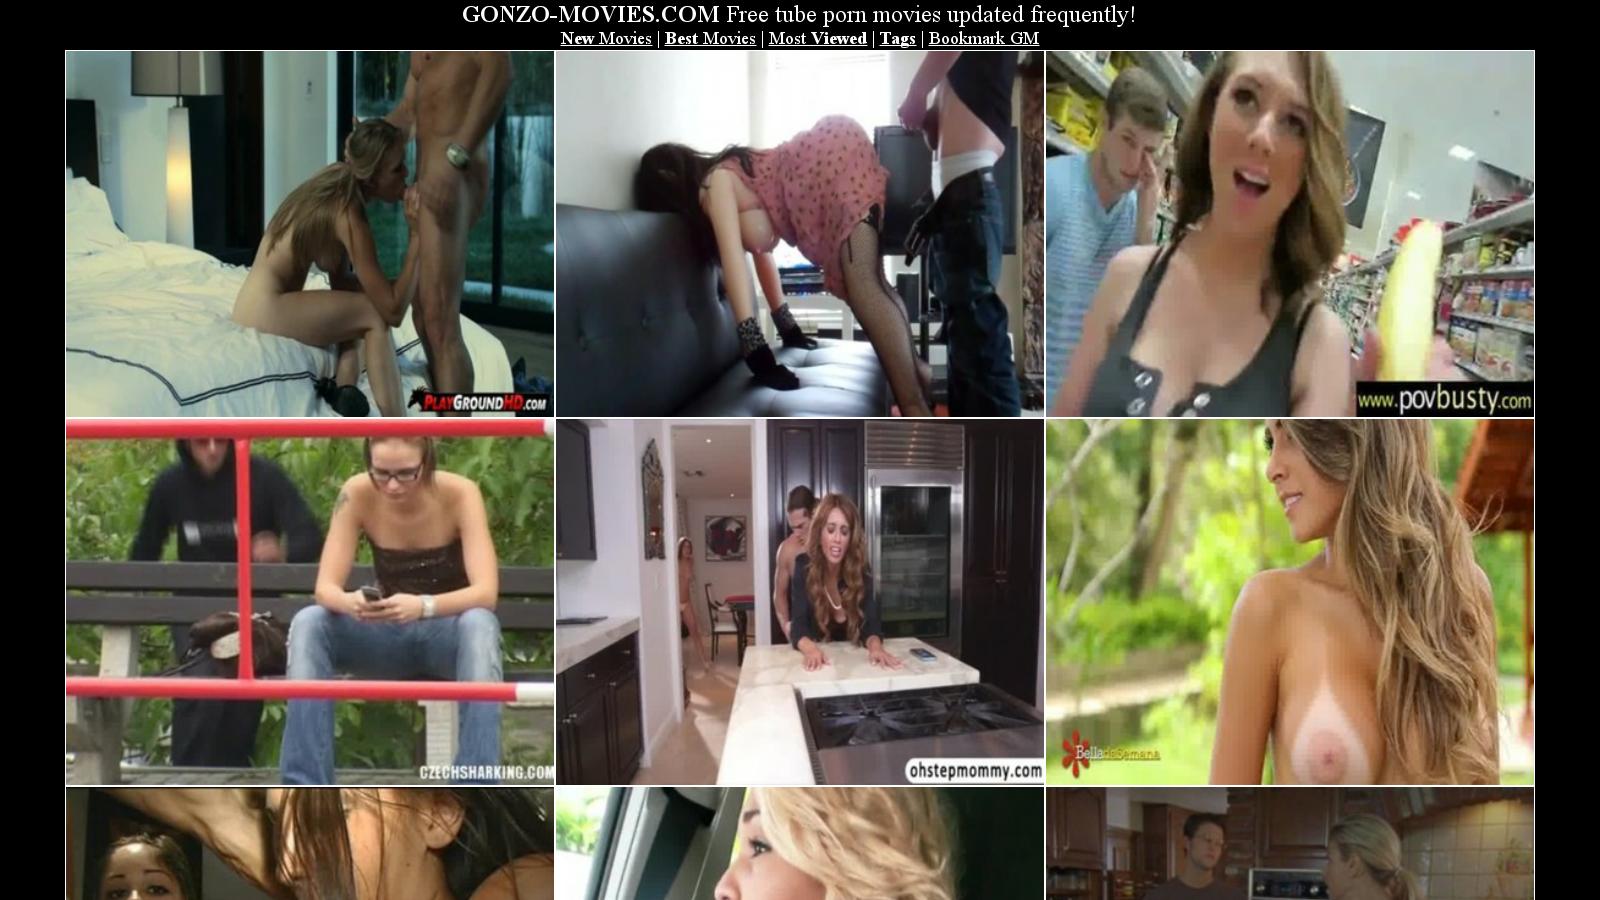 Gonzo Videos Sex 78